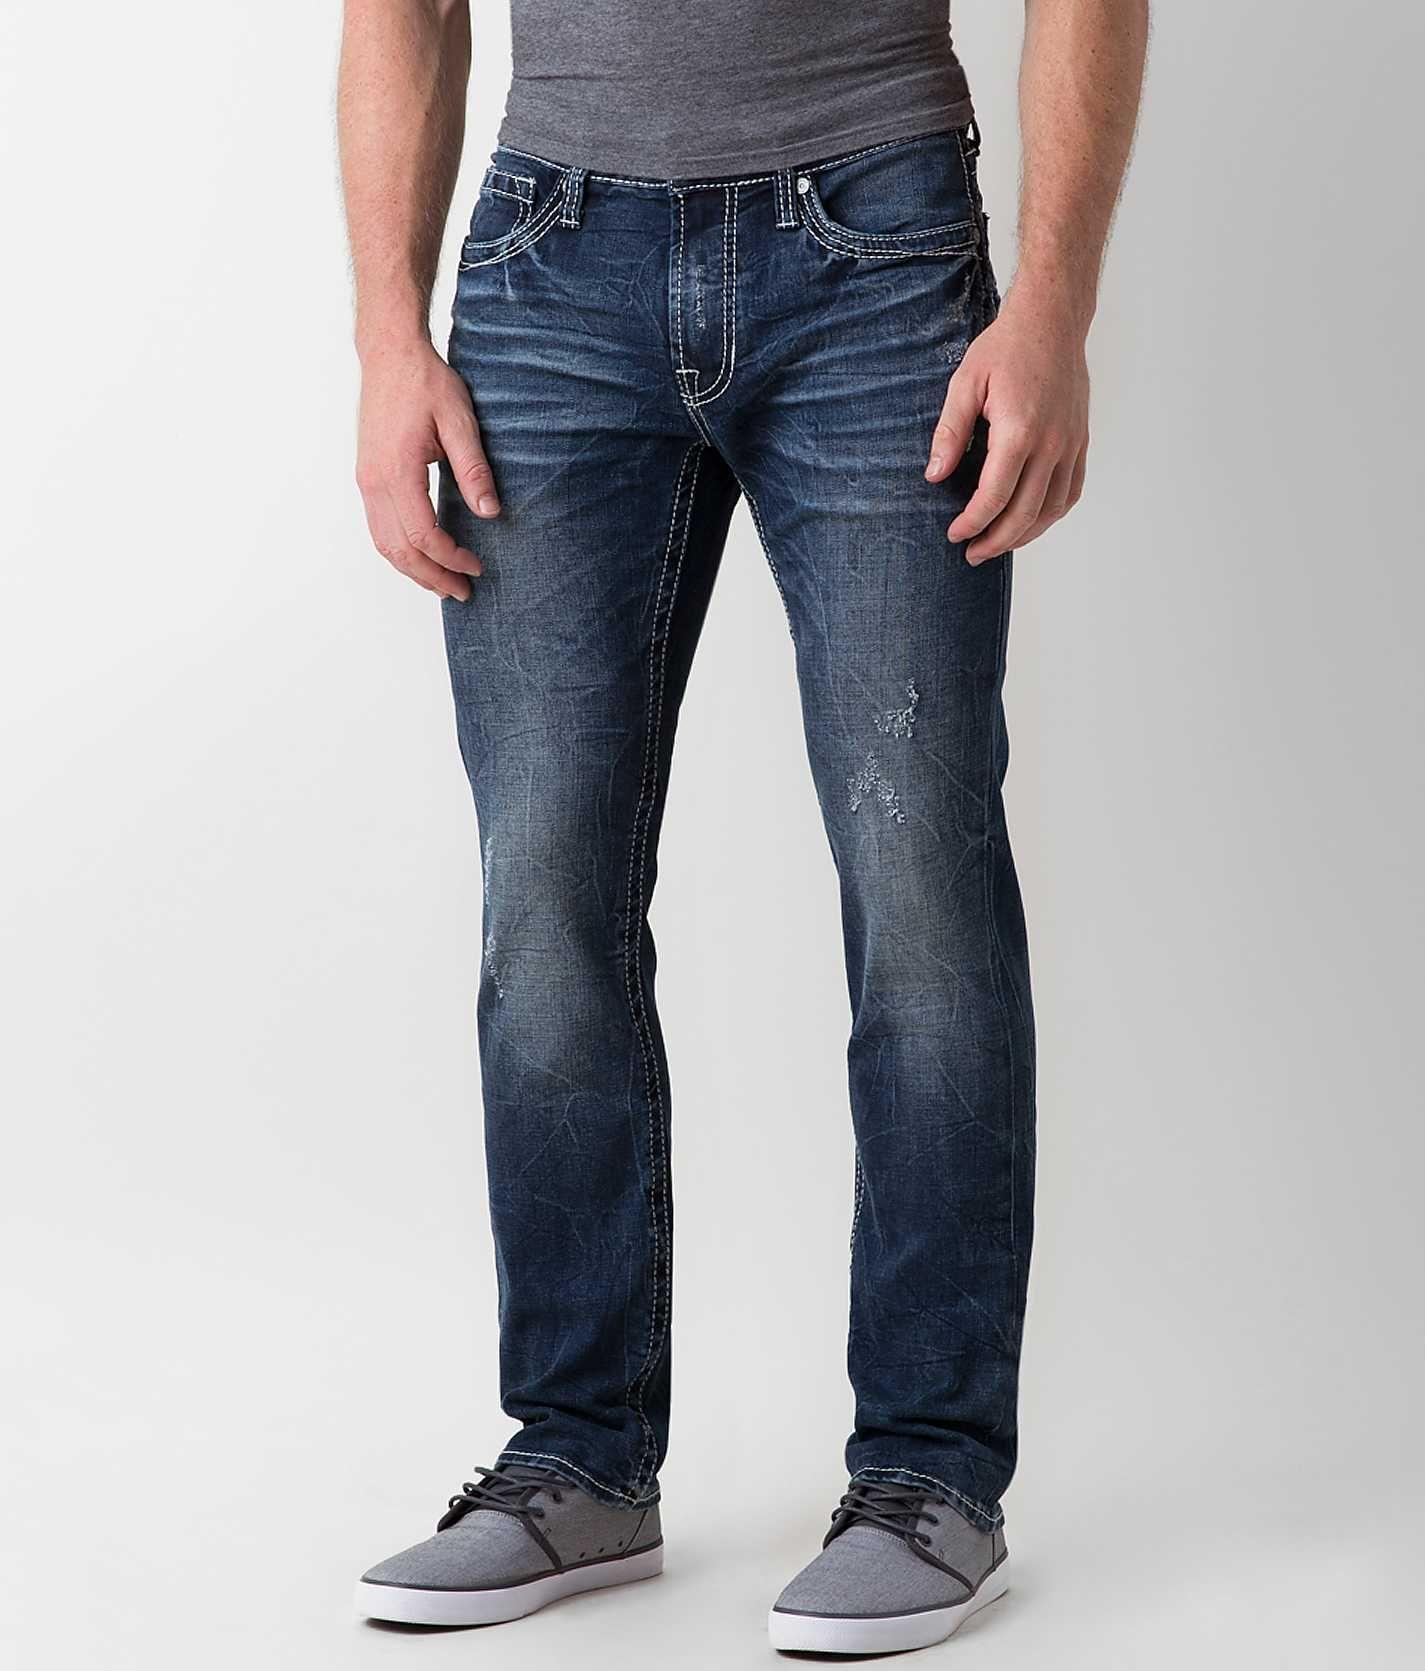 Salvage Havoc Slim Straight Jean - Men' Jeans Buckle